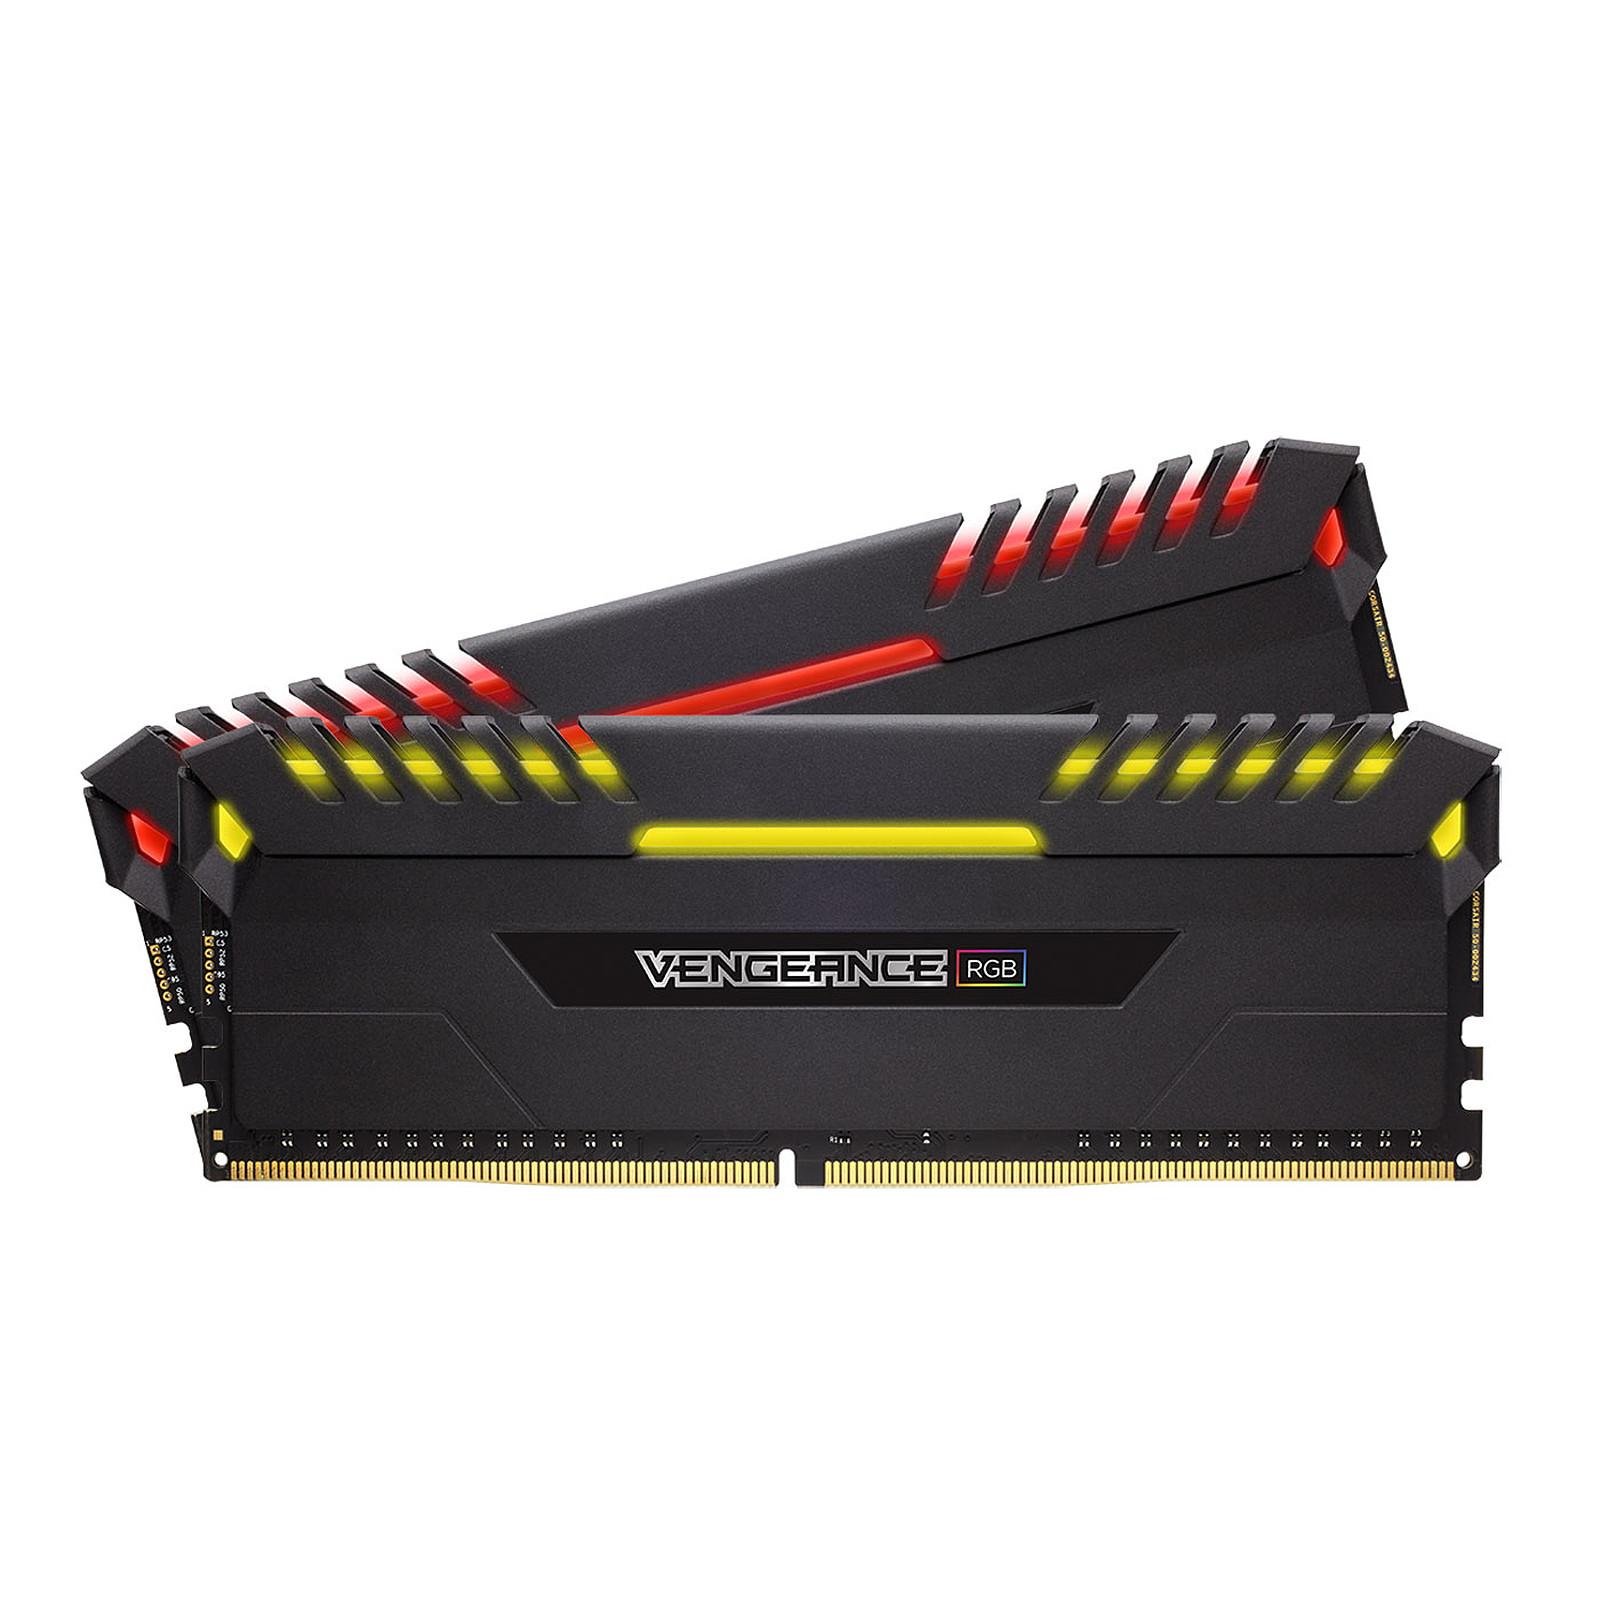 Corsair Vengeance RGB Series 16 Go (2x 8 Go) DDR4 3000MHz CL16 - Noir